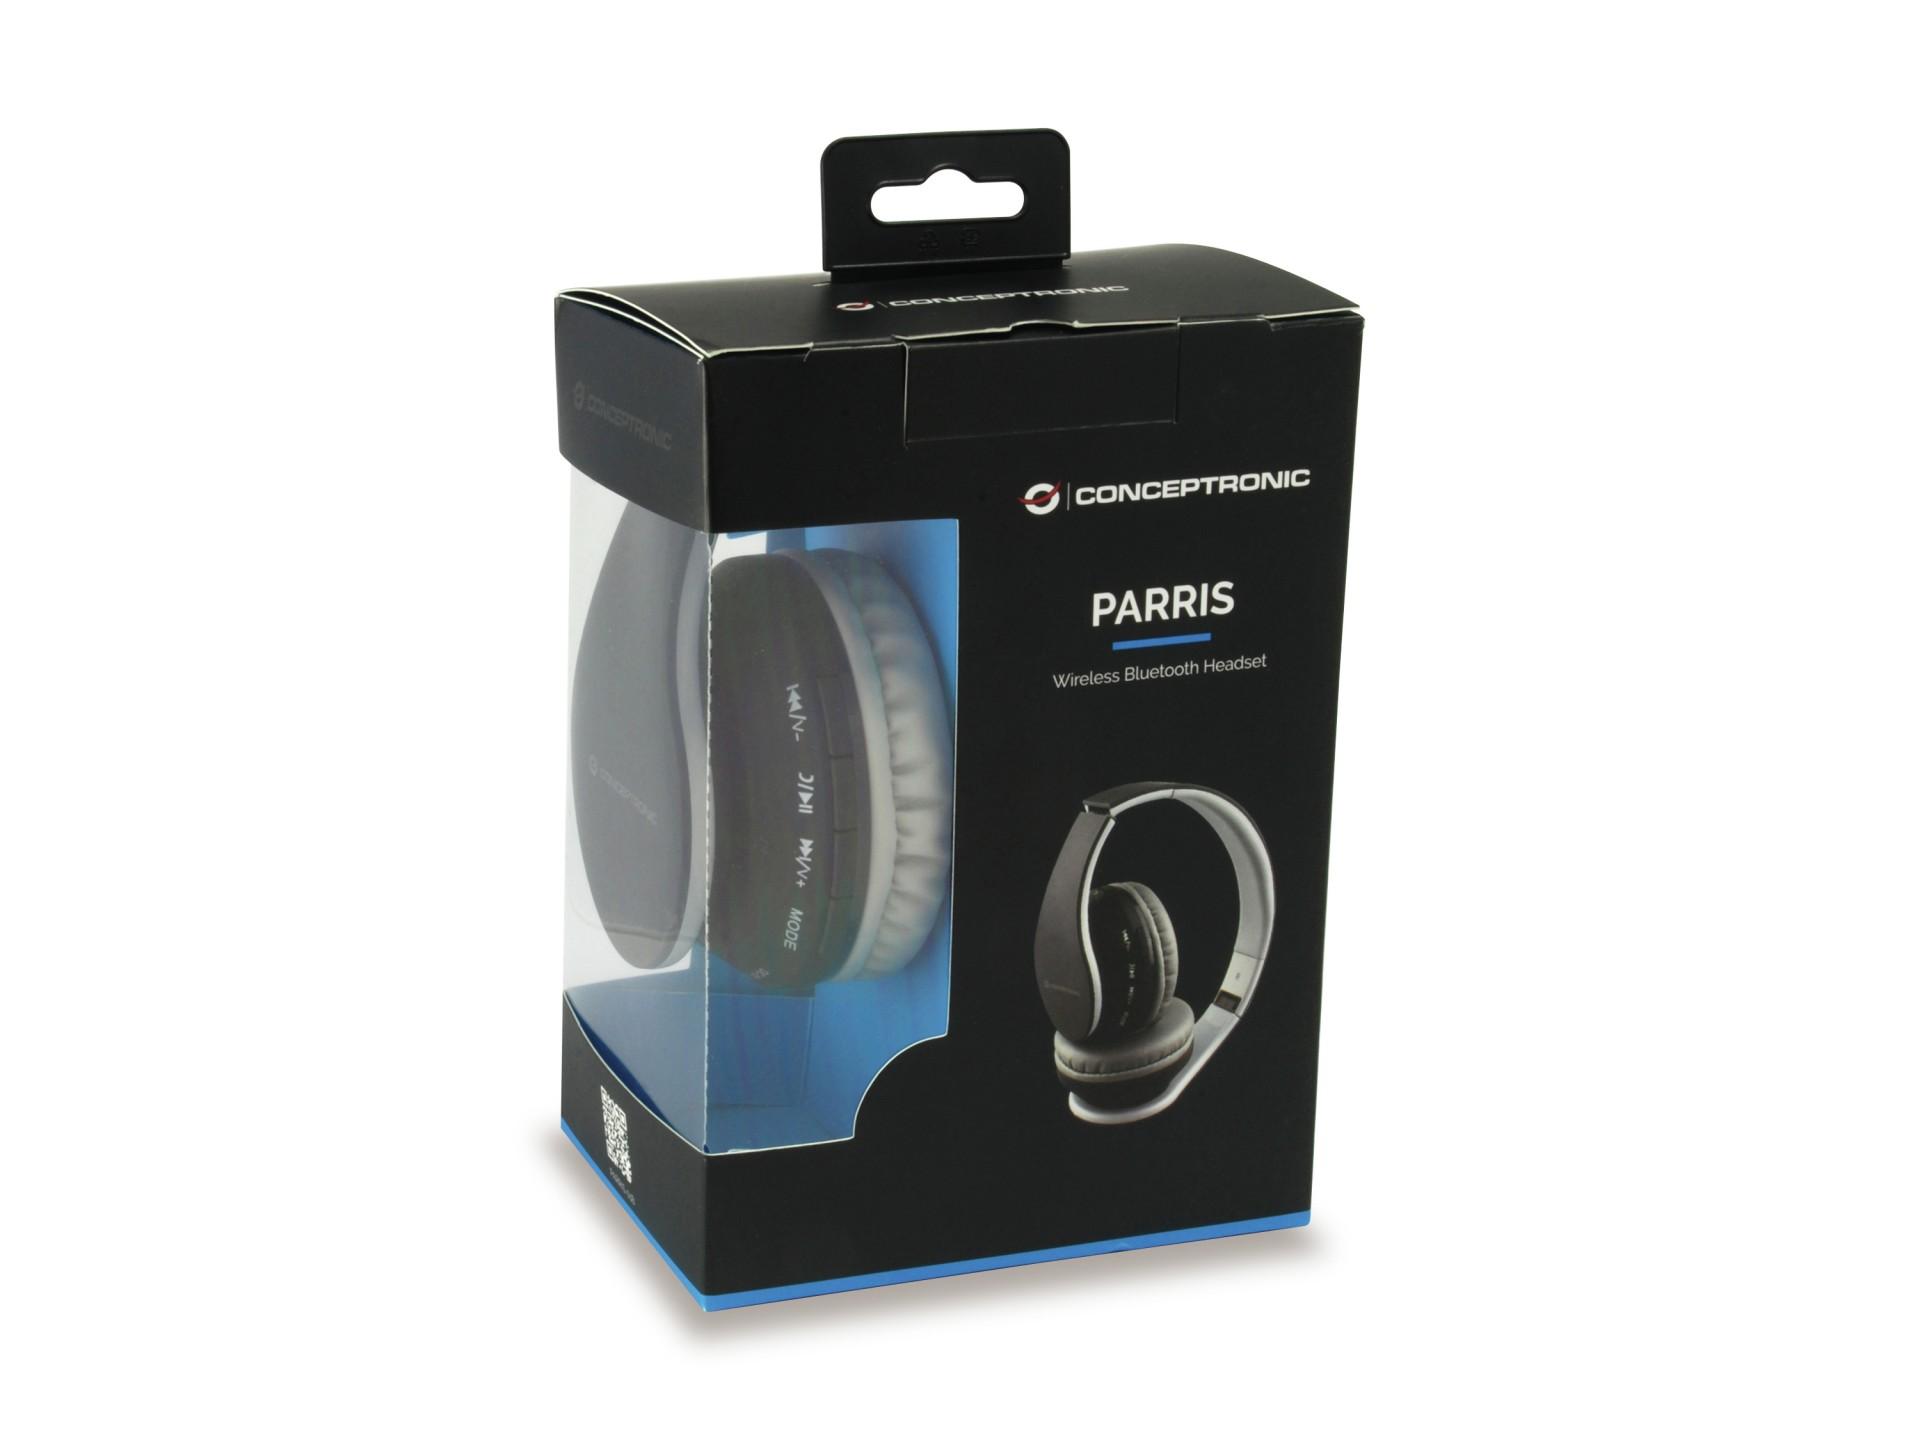 Wireless Bluetooth Parris 01B